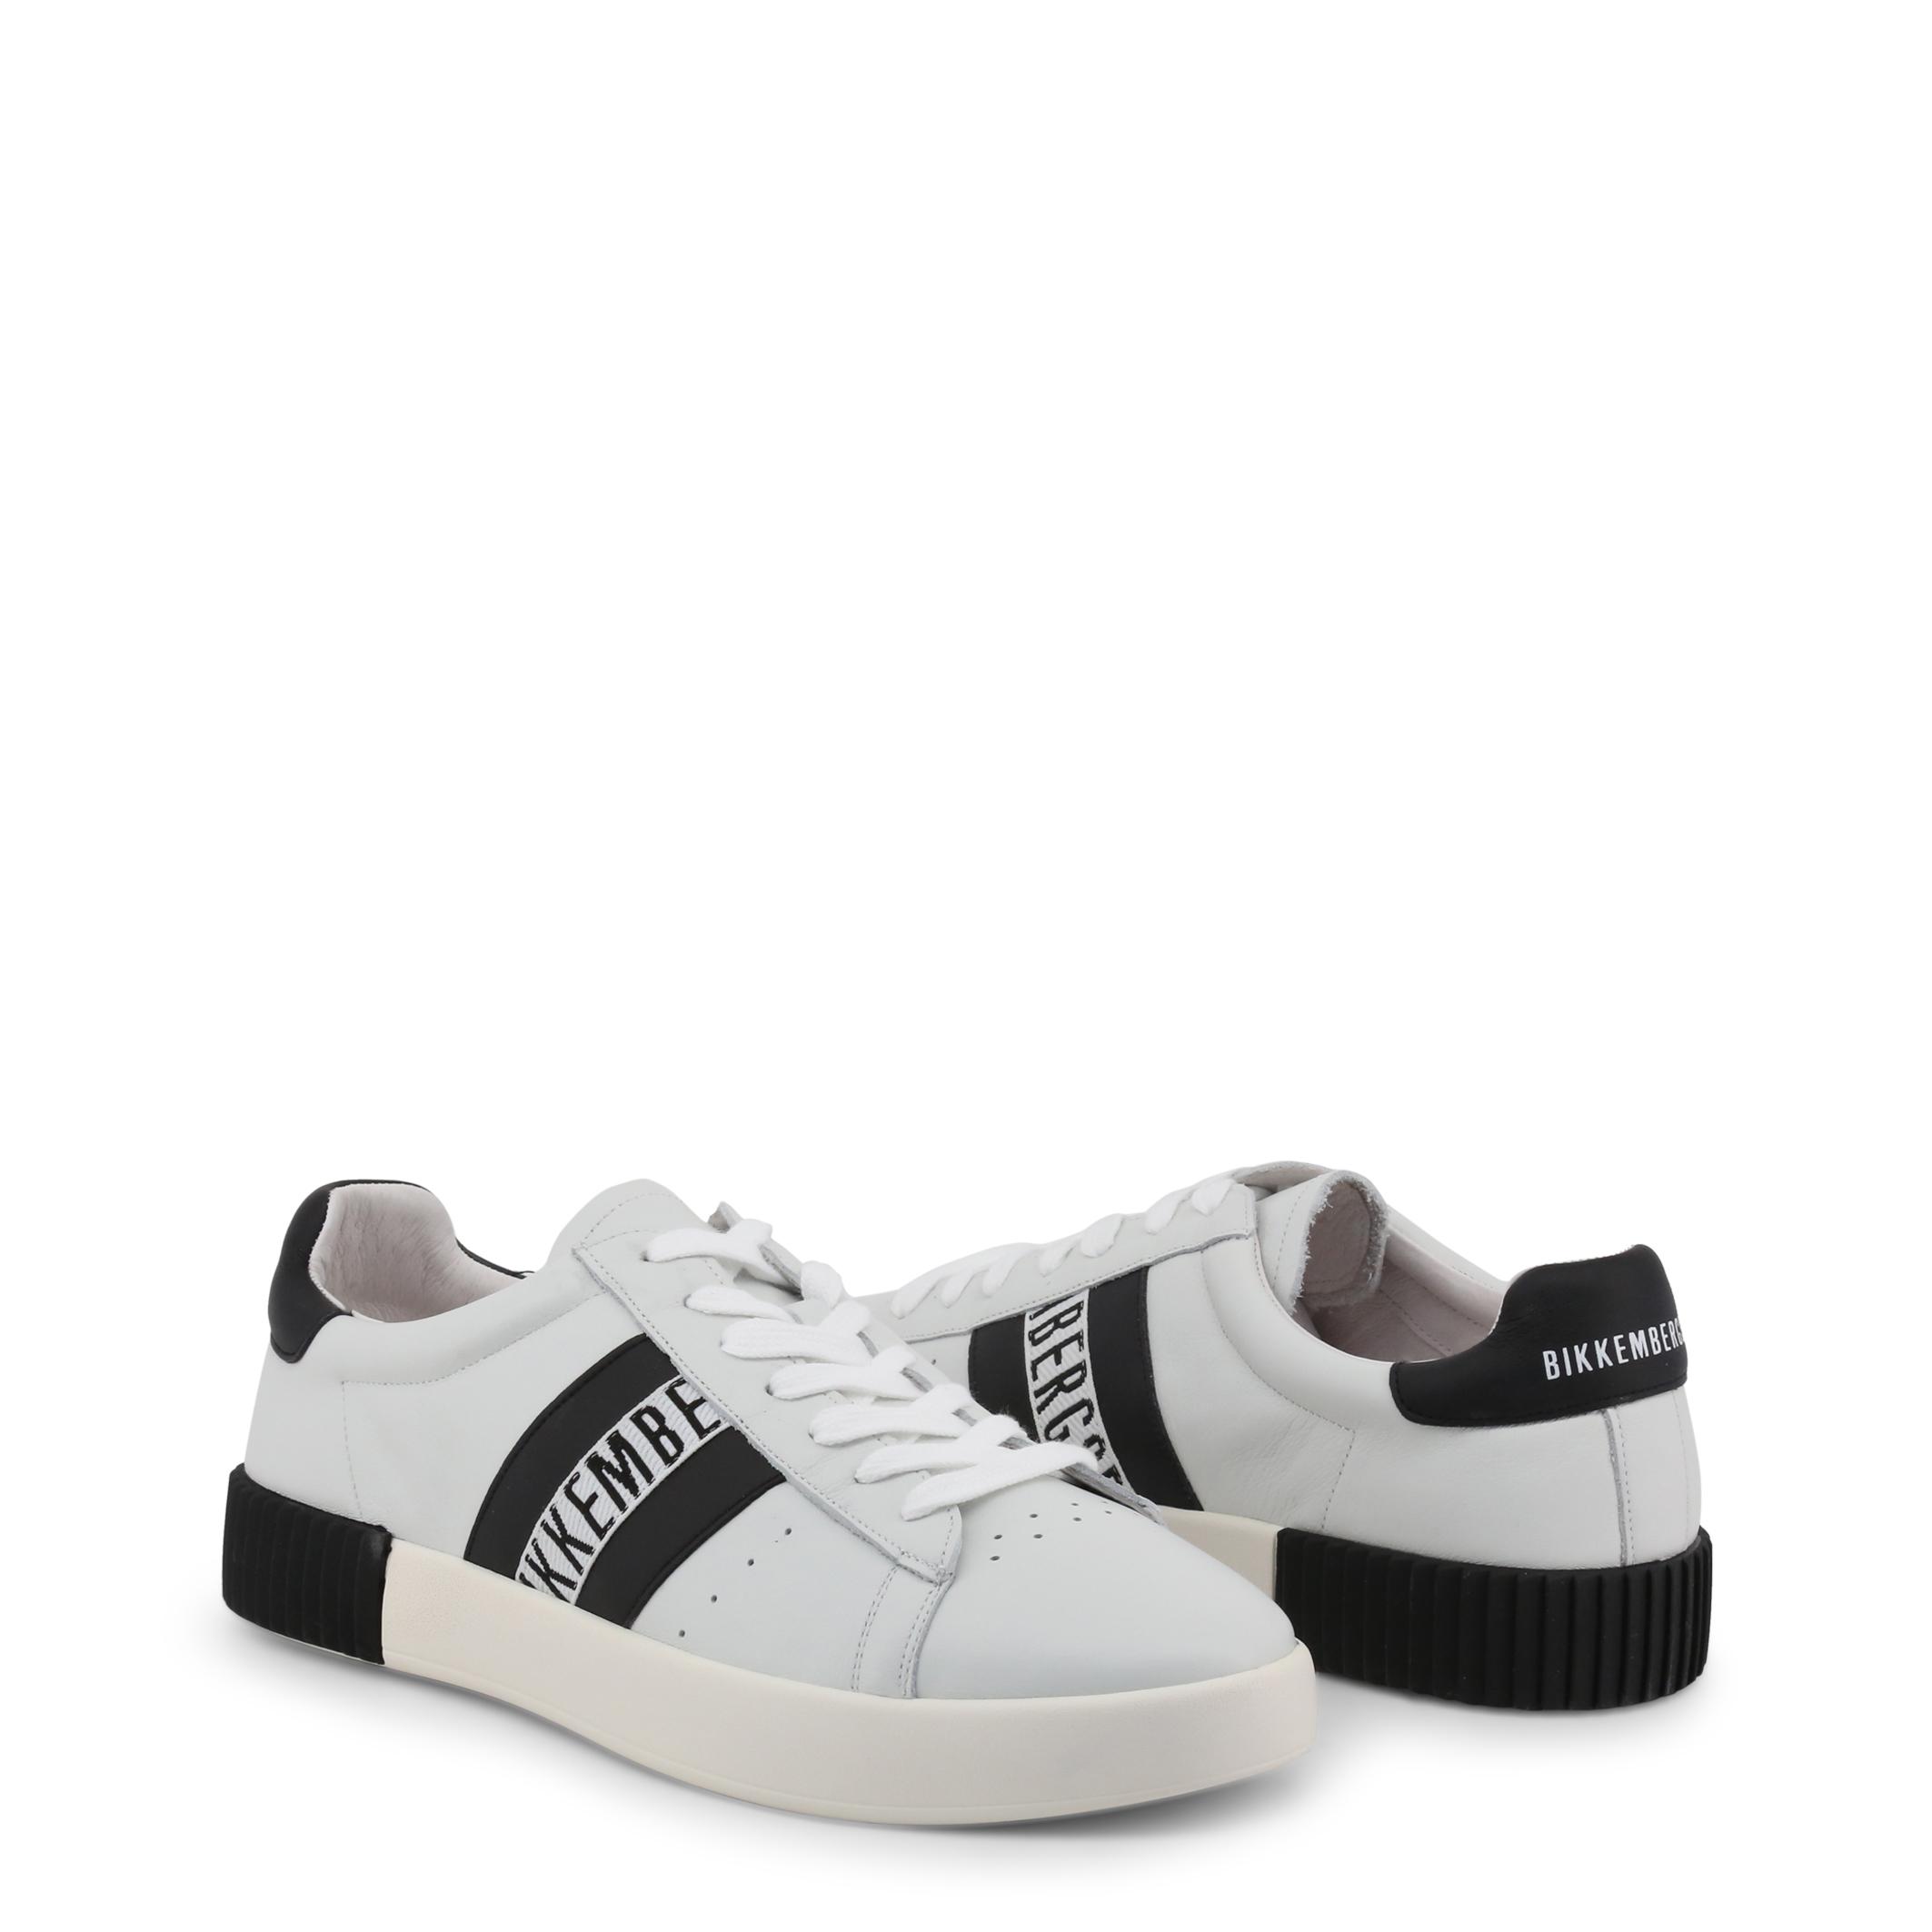 Sneakers-Bikkembergs-COSMOS-2434-Uomo-Bianco-98820 miniatura 2